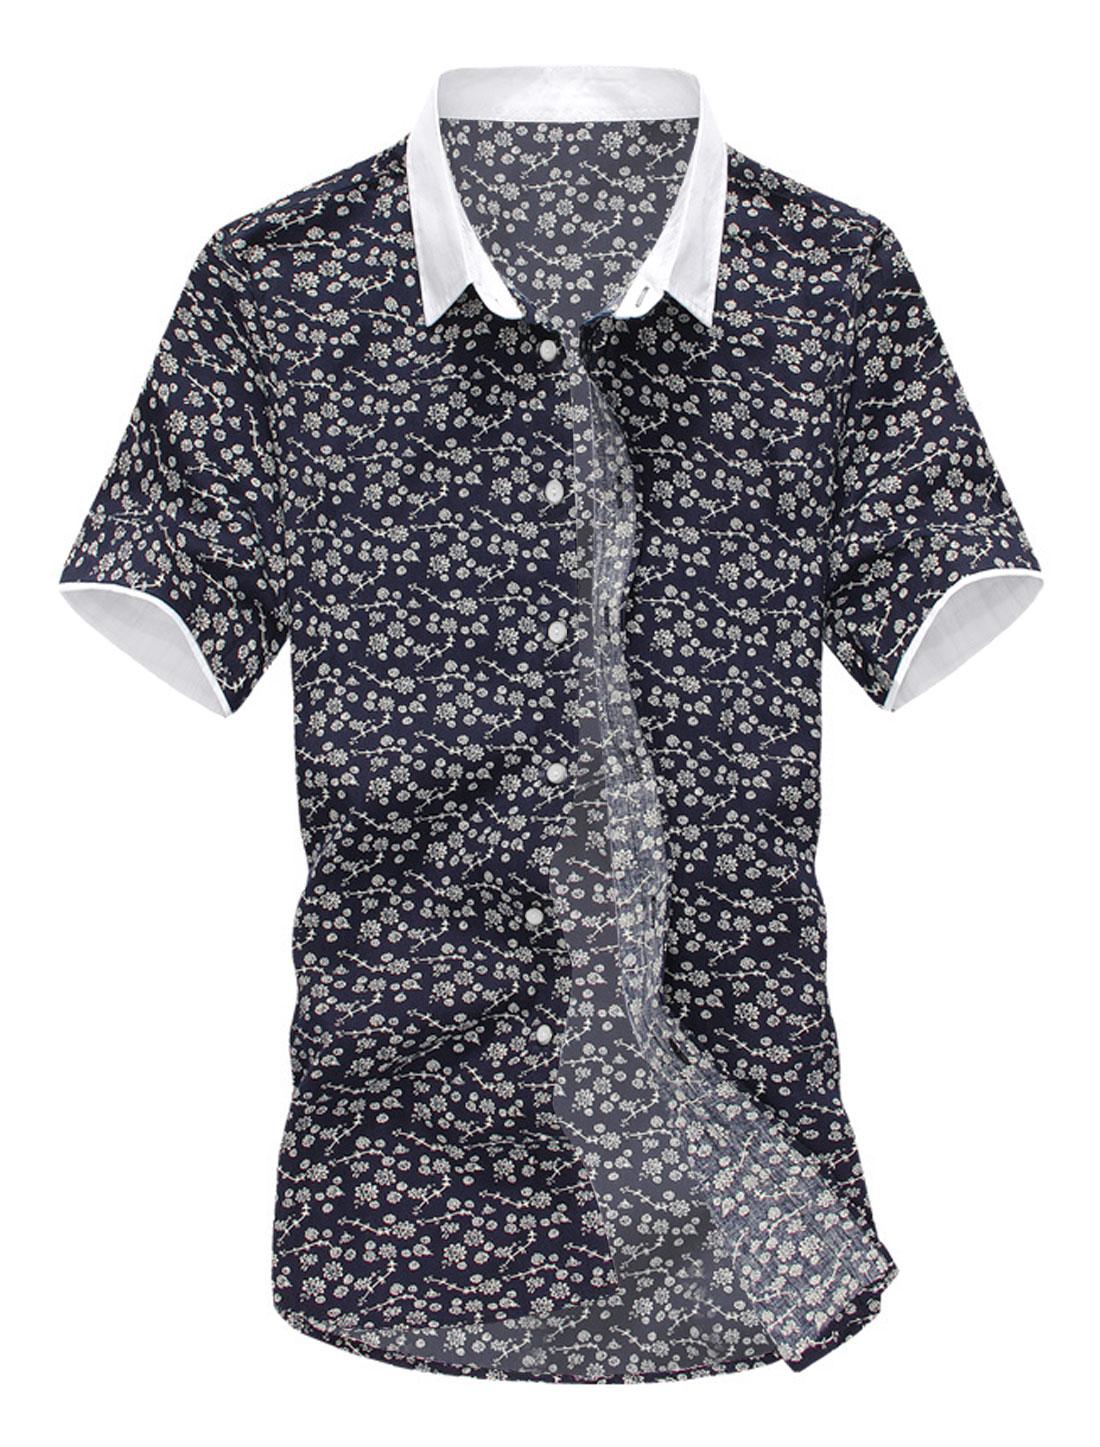 Men Floral Prints Short Sleeves Point Collar Casual Shirt Navy Blue Beige M